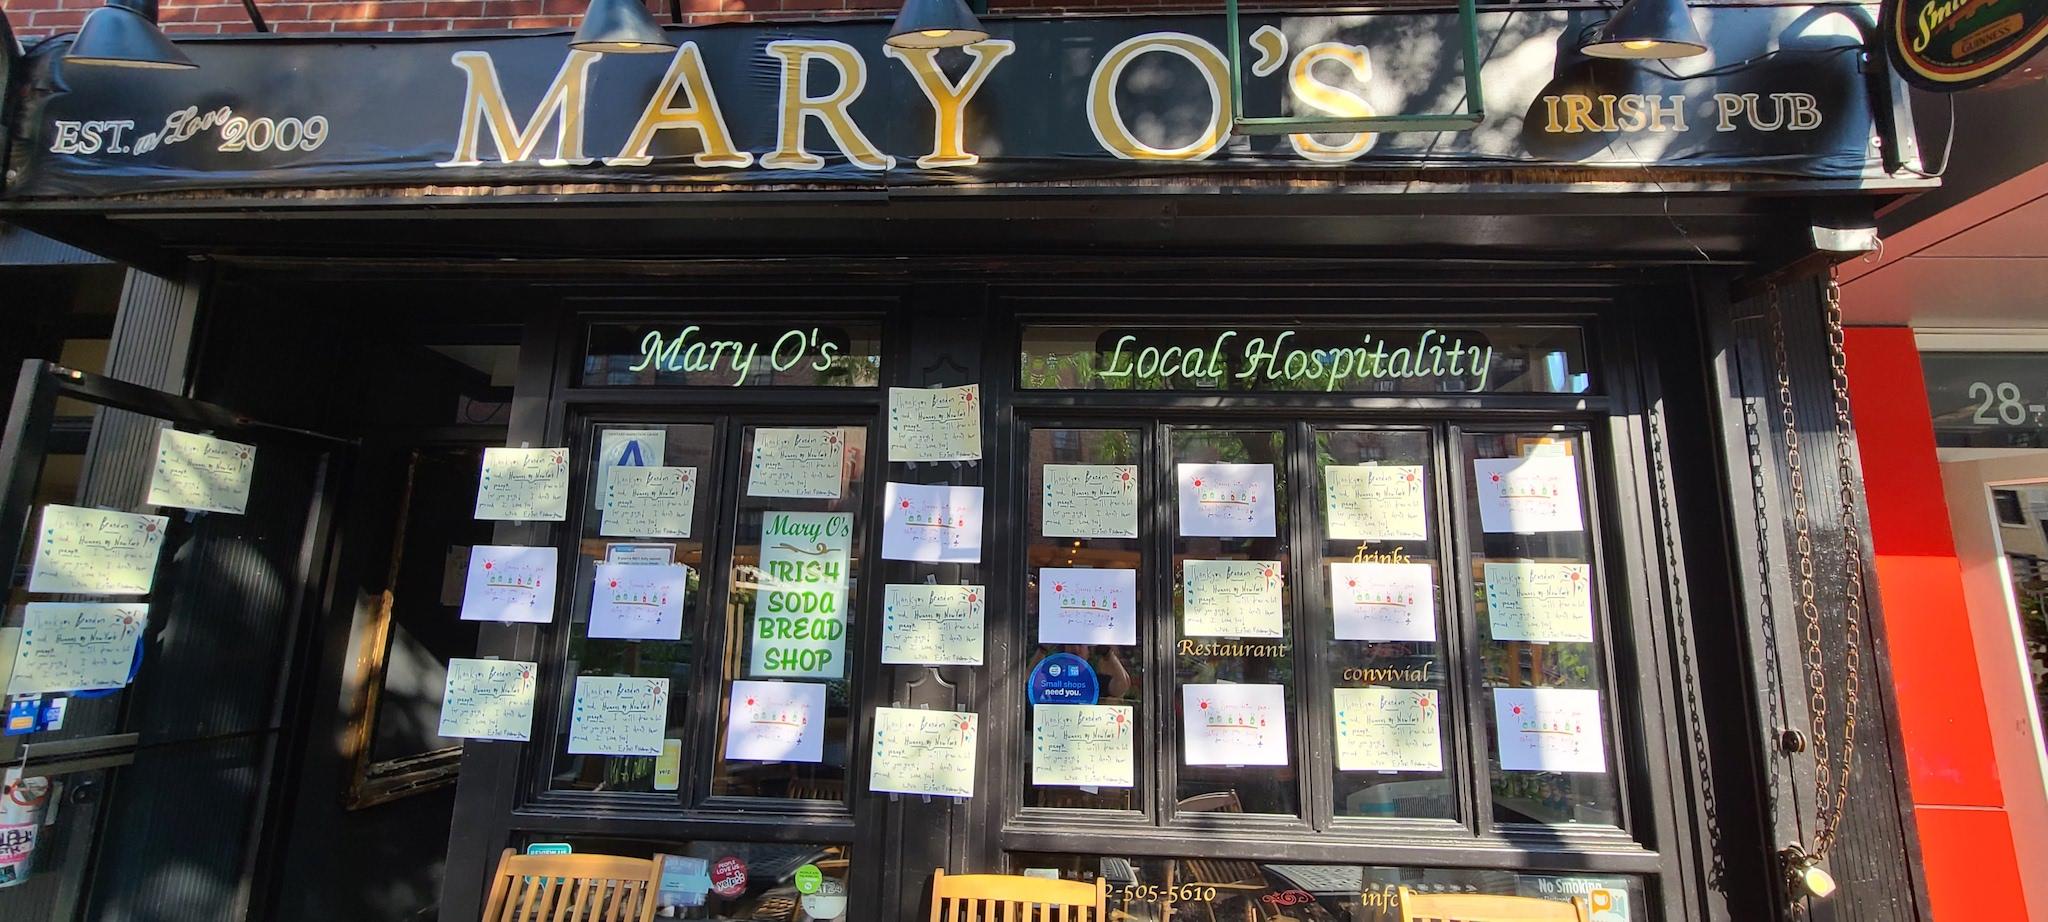 Mary O's Irish pub in the East Village